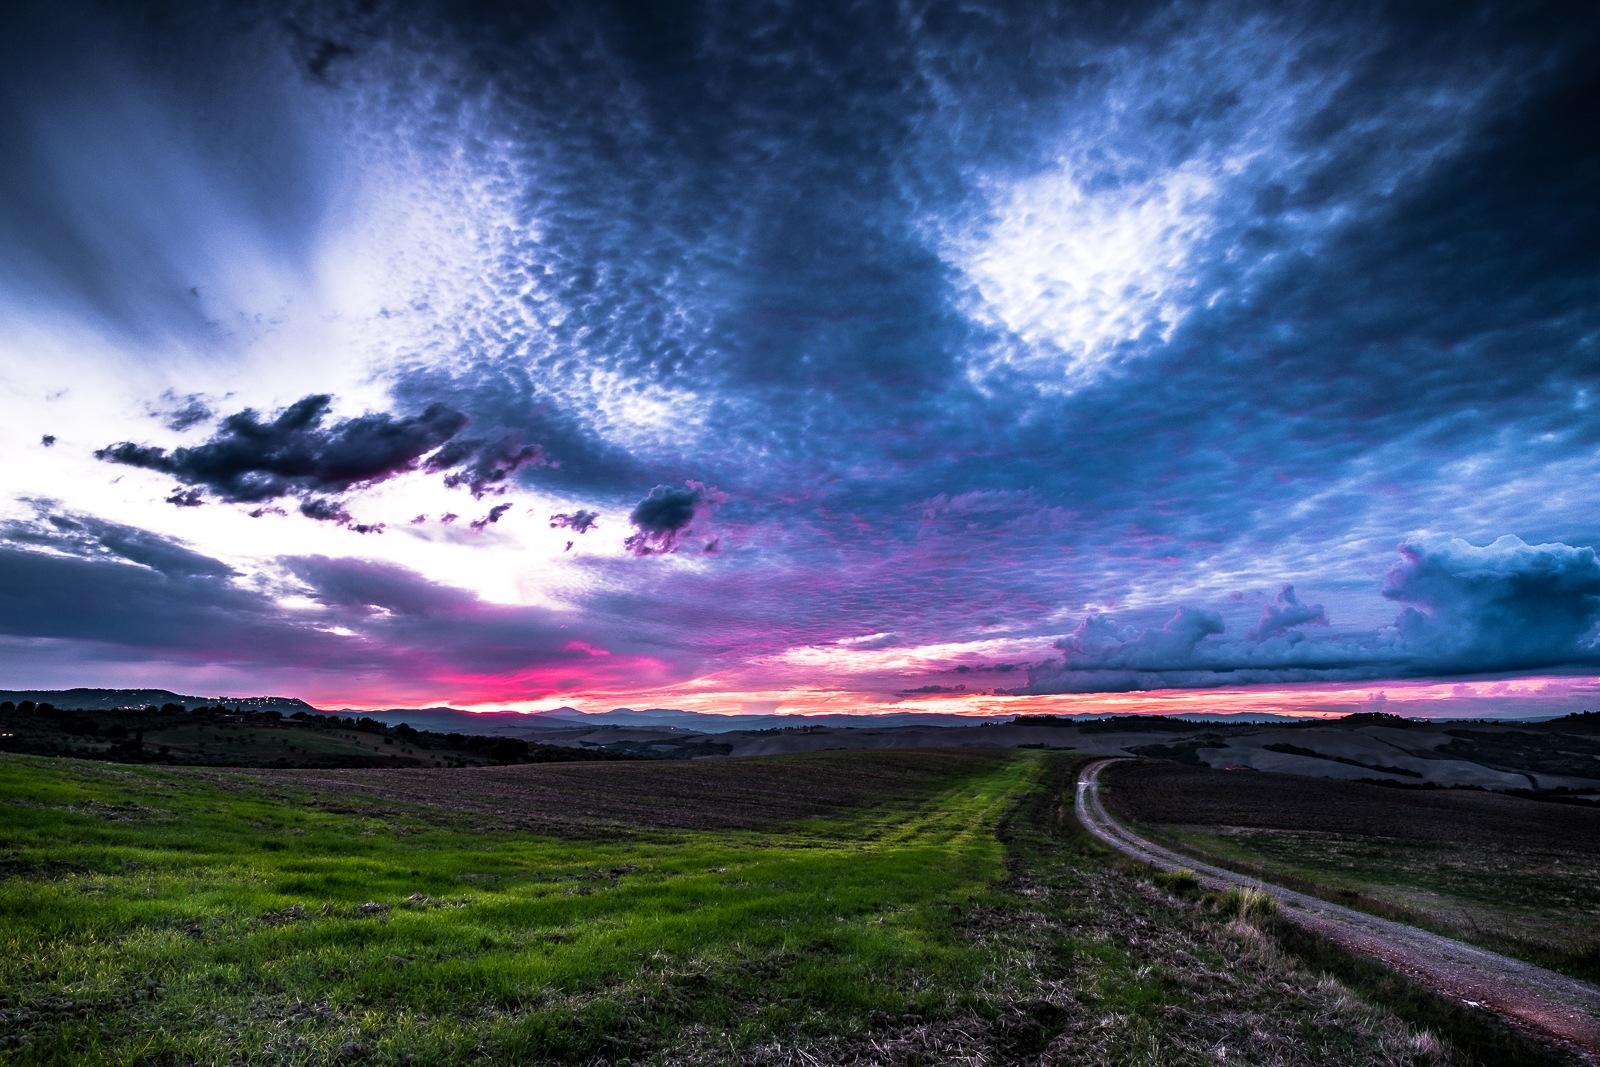 Blue Autumnal Sunset by Francesco Monari